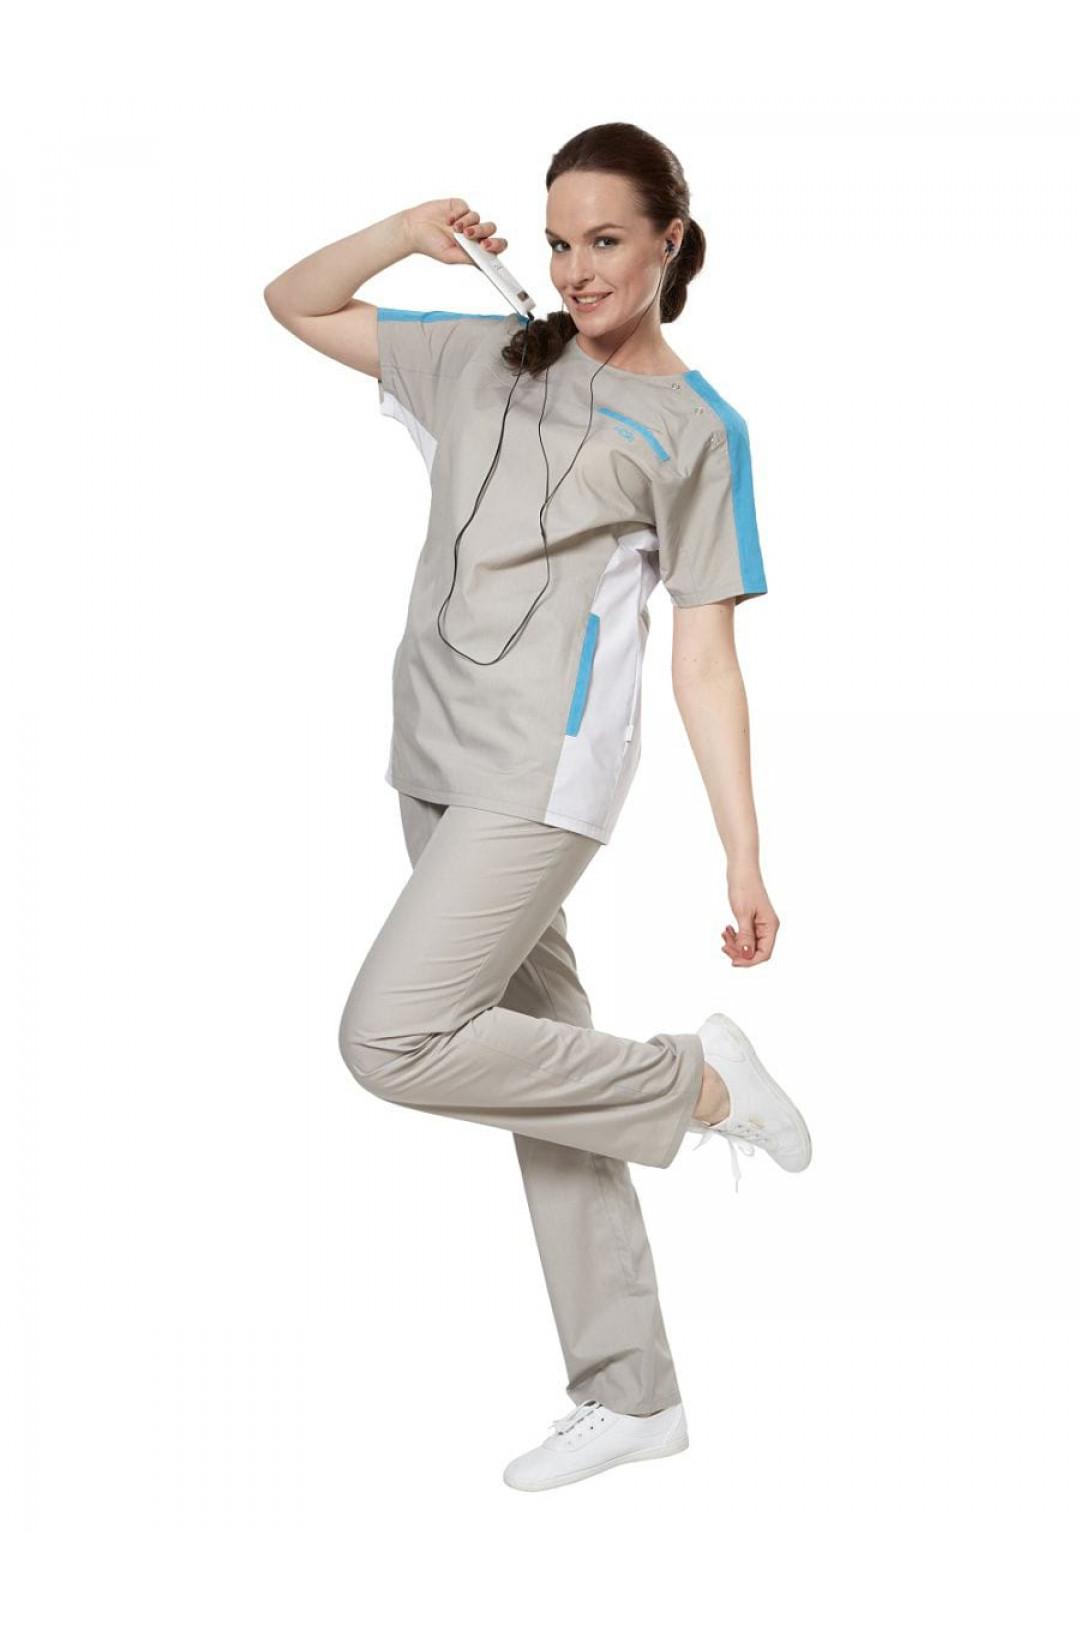 Костюм медицинский женский Аура Спорт (серый/голубой, тиси)